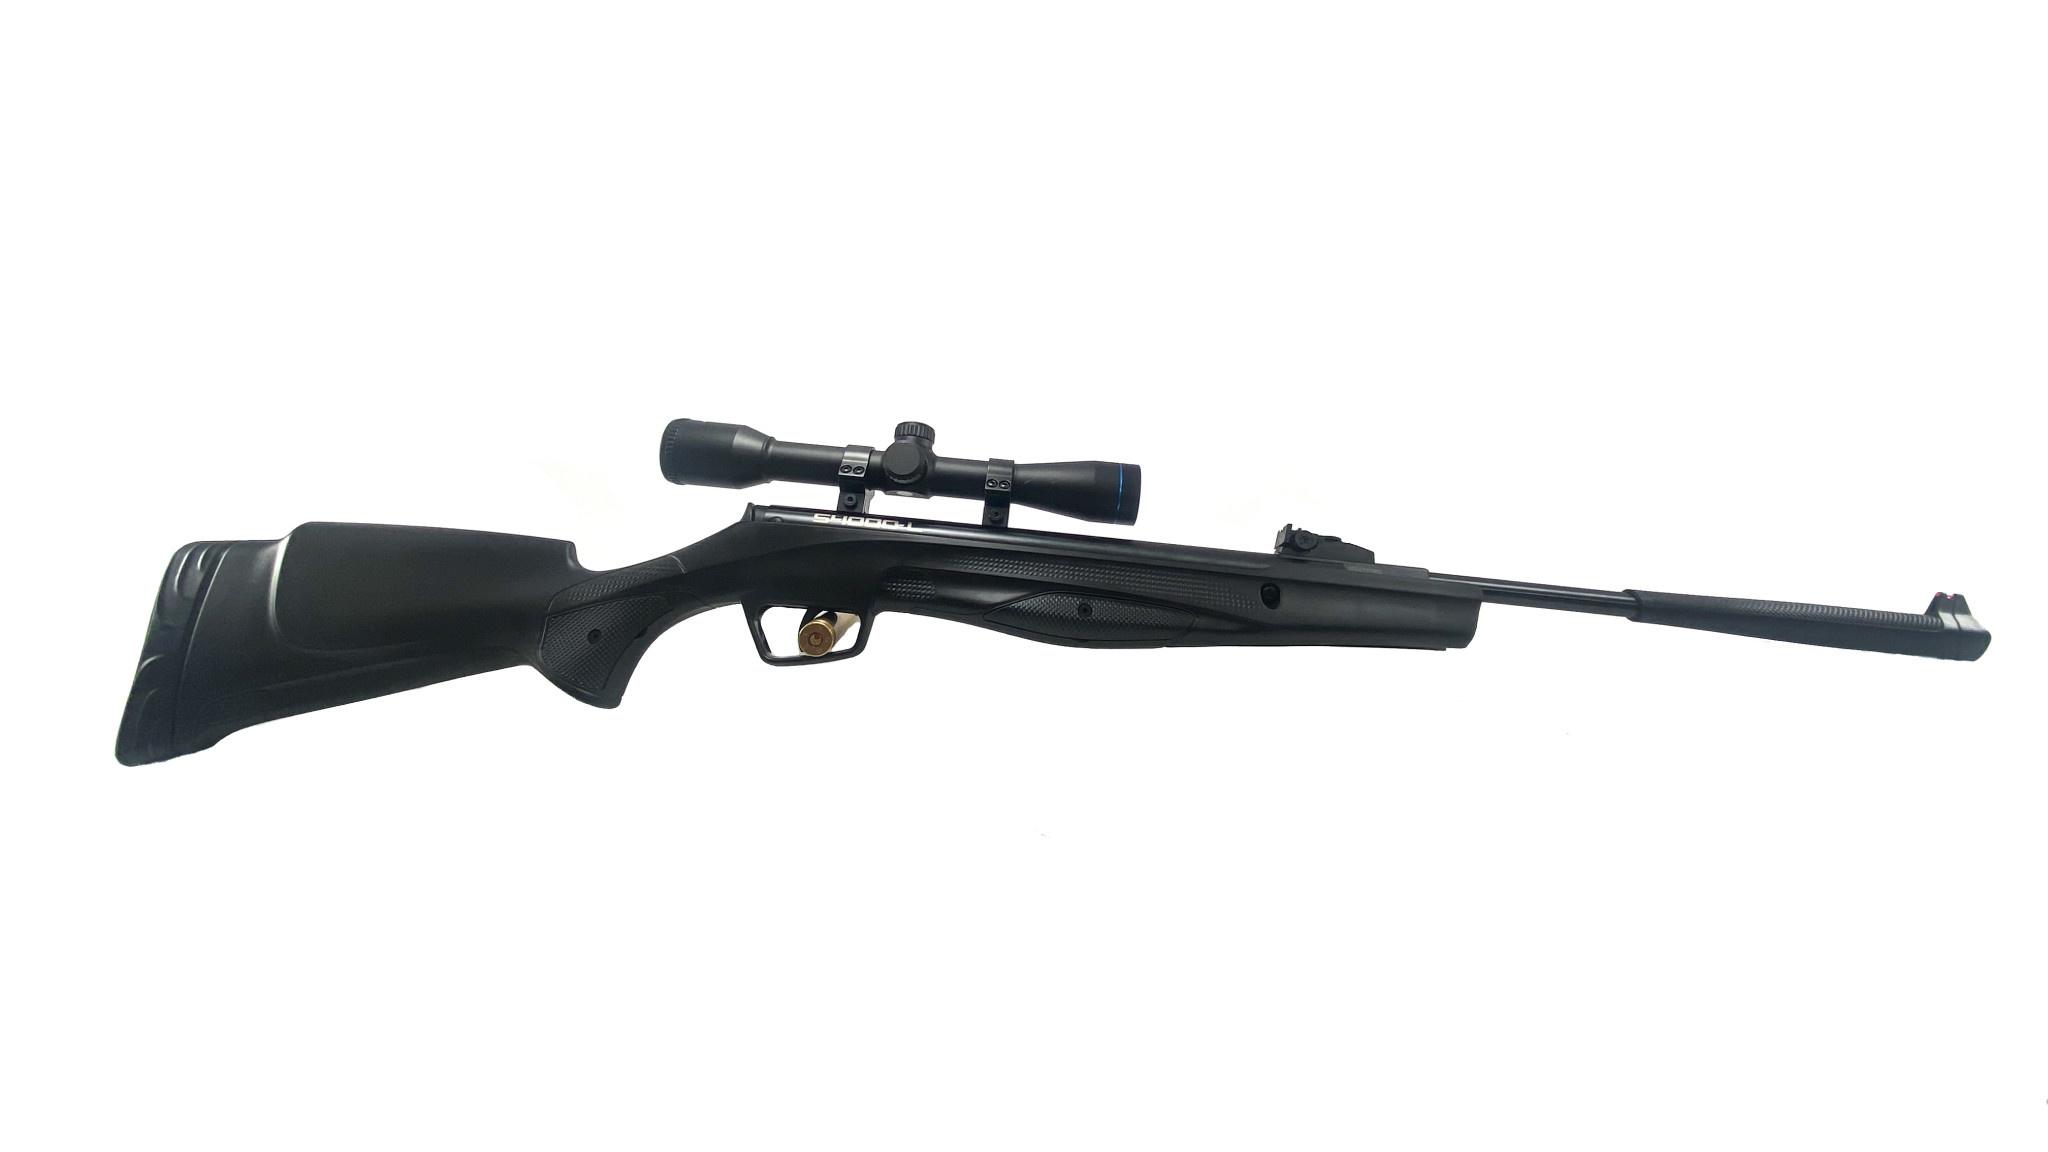 Stoeger S4000L 1200 fps 177 cal w/4x32mm scope